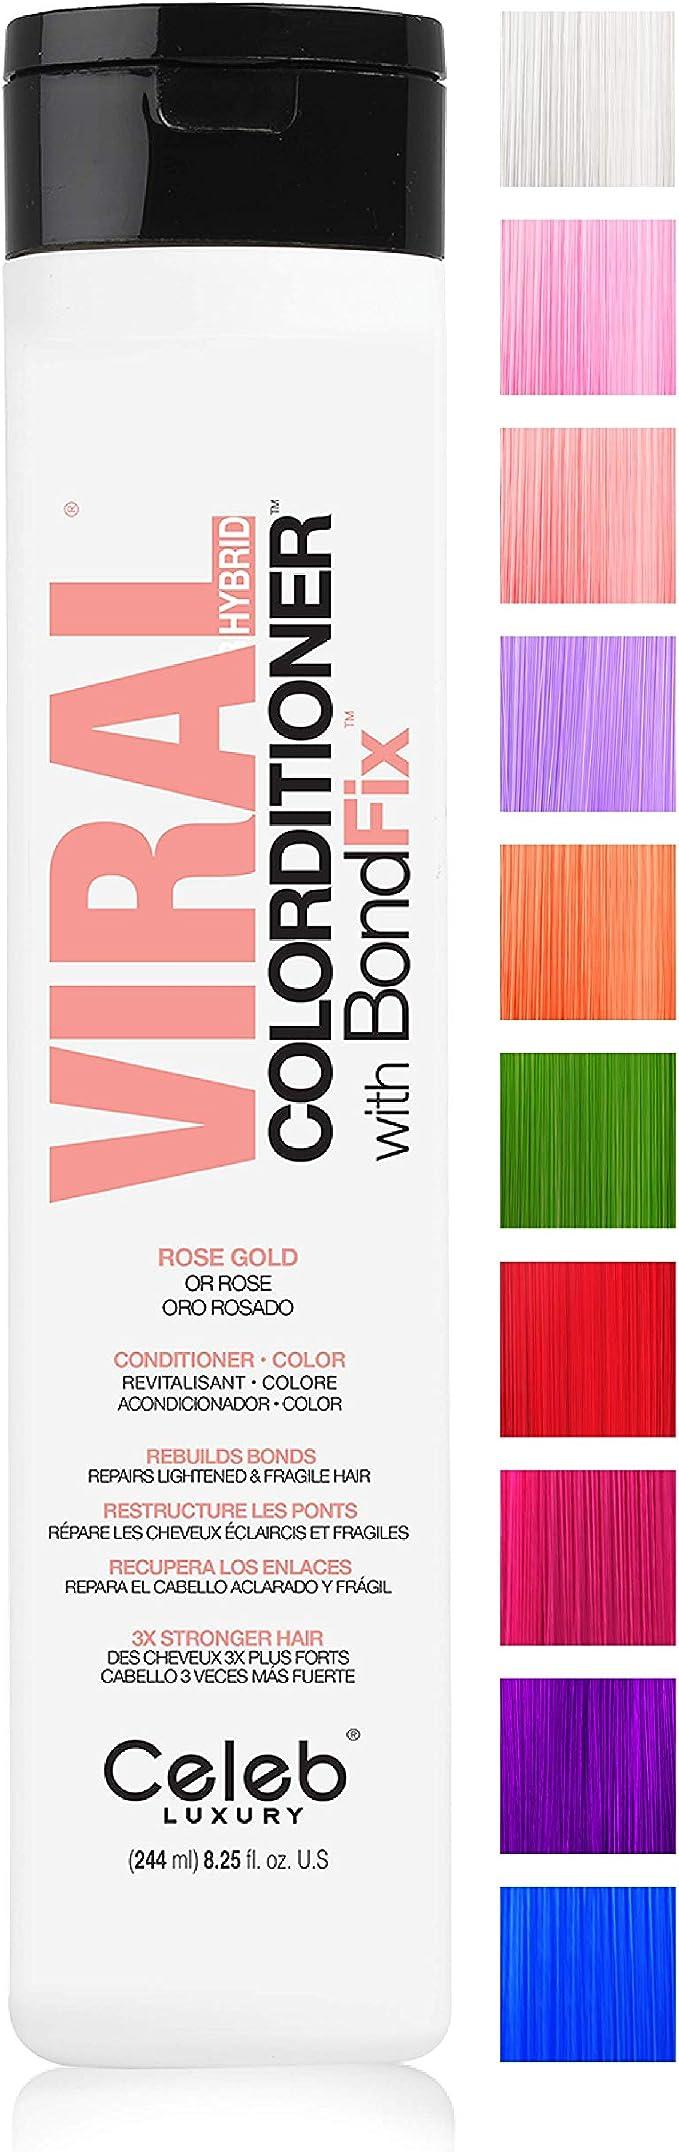 CELEB LUXURY VIRAL HYBRID COLORDITIONER ROSE ...